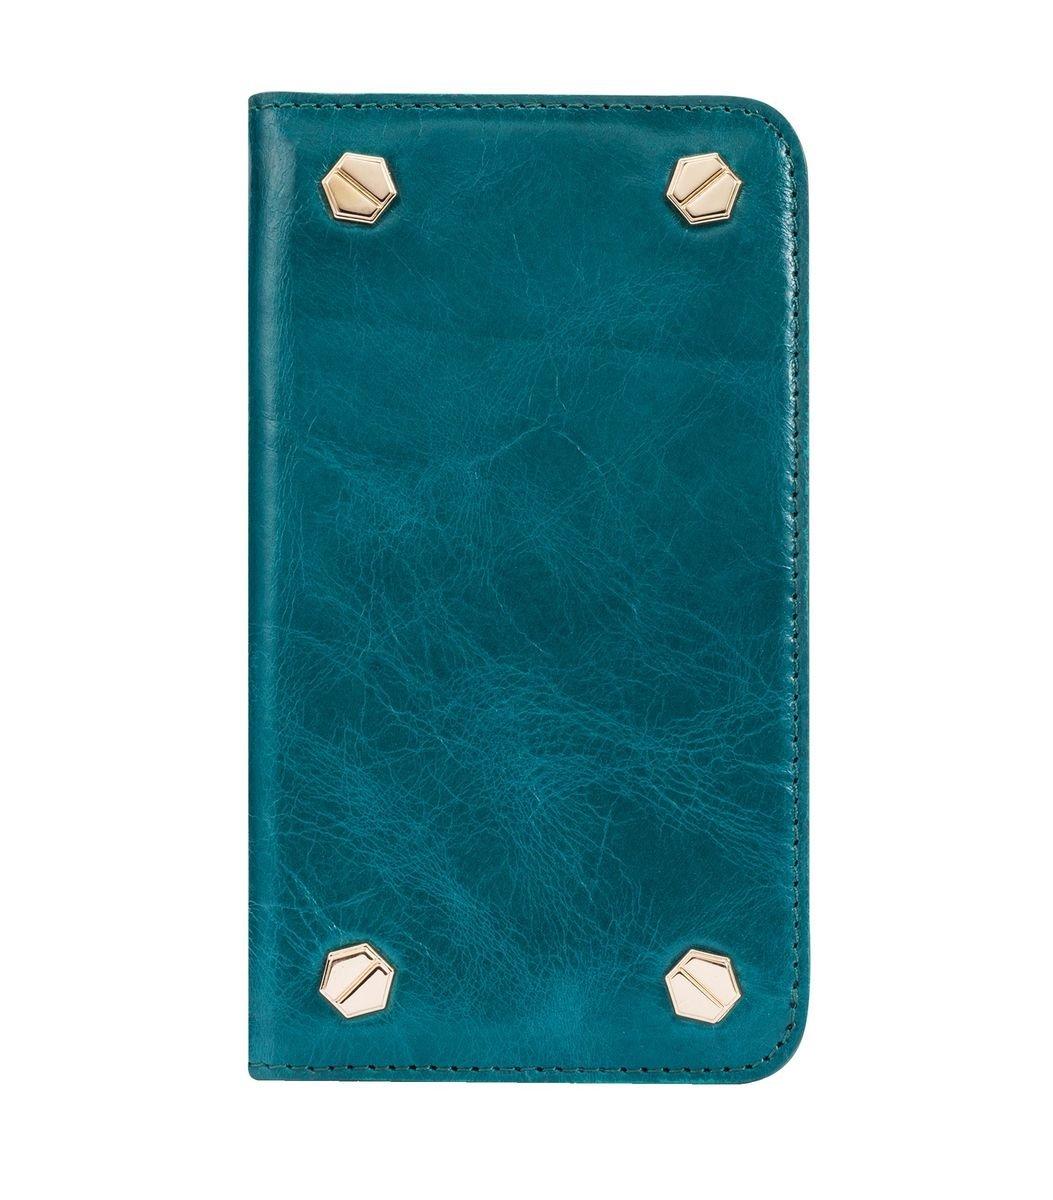 "Apple IPhone6 Plus/6s Plus (5.5"") Hex-shine 系列義大利高級牛皮時尚手機套 (奧利佛藍色)"